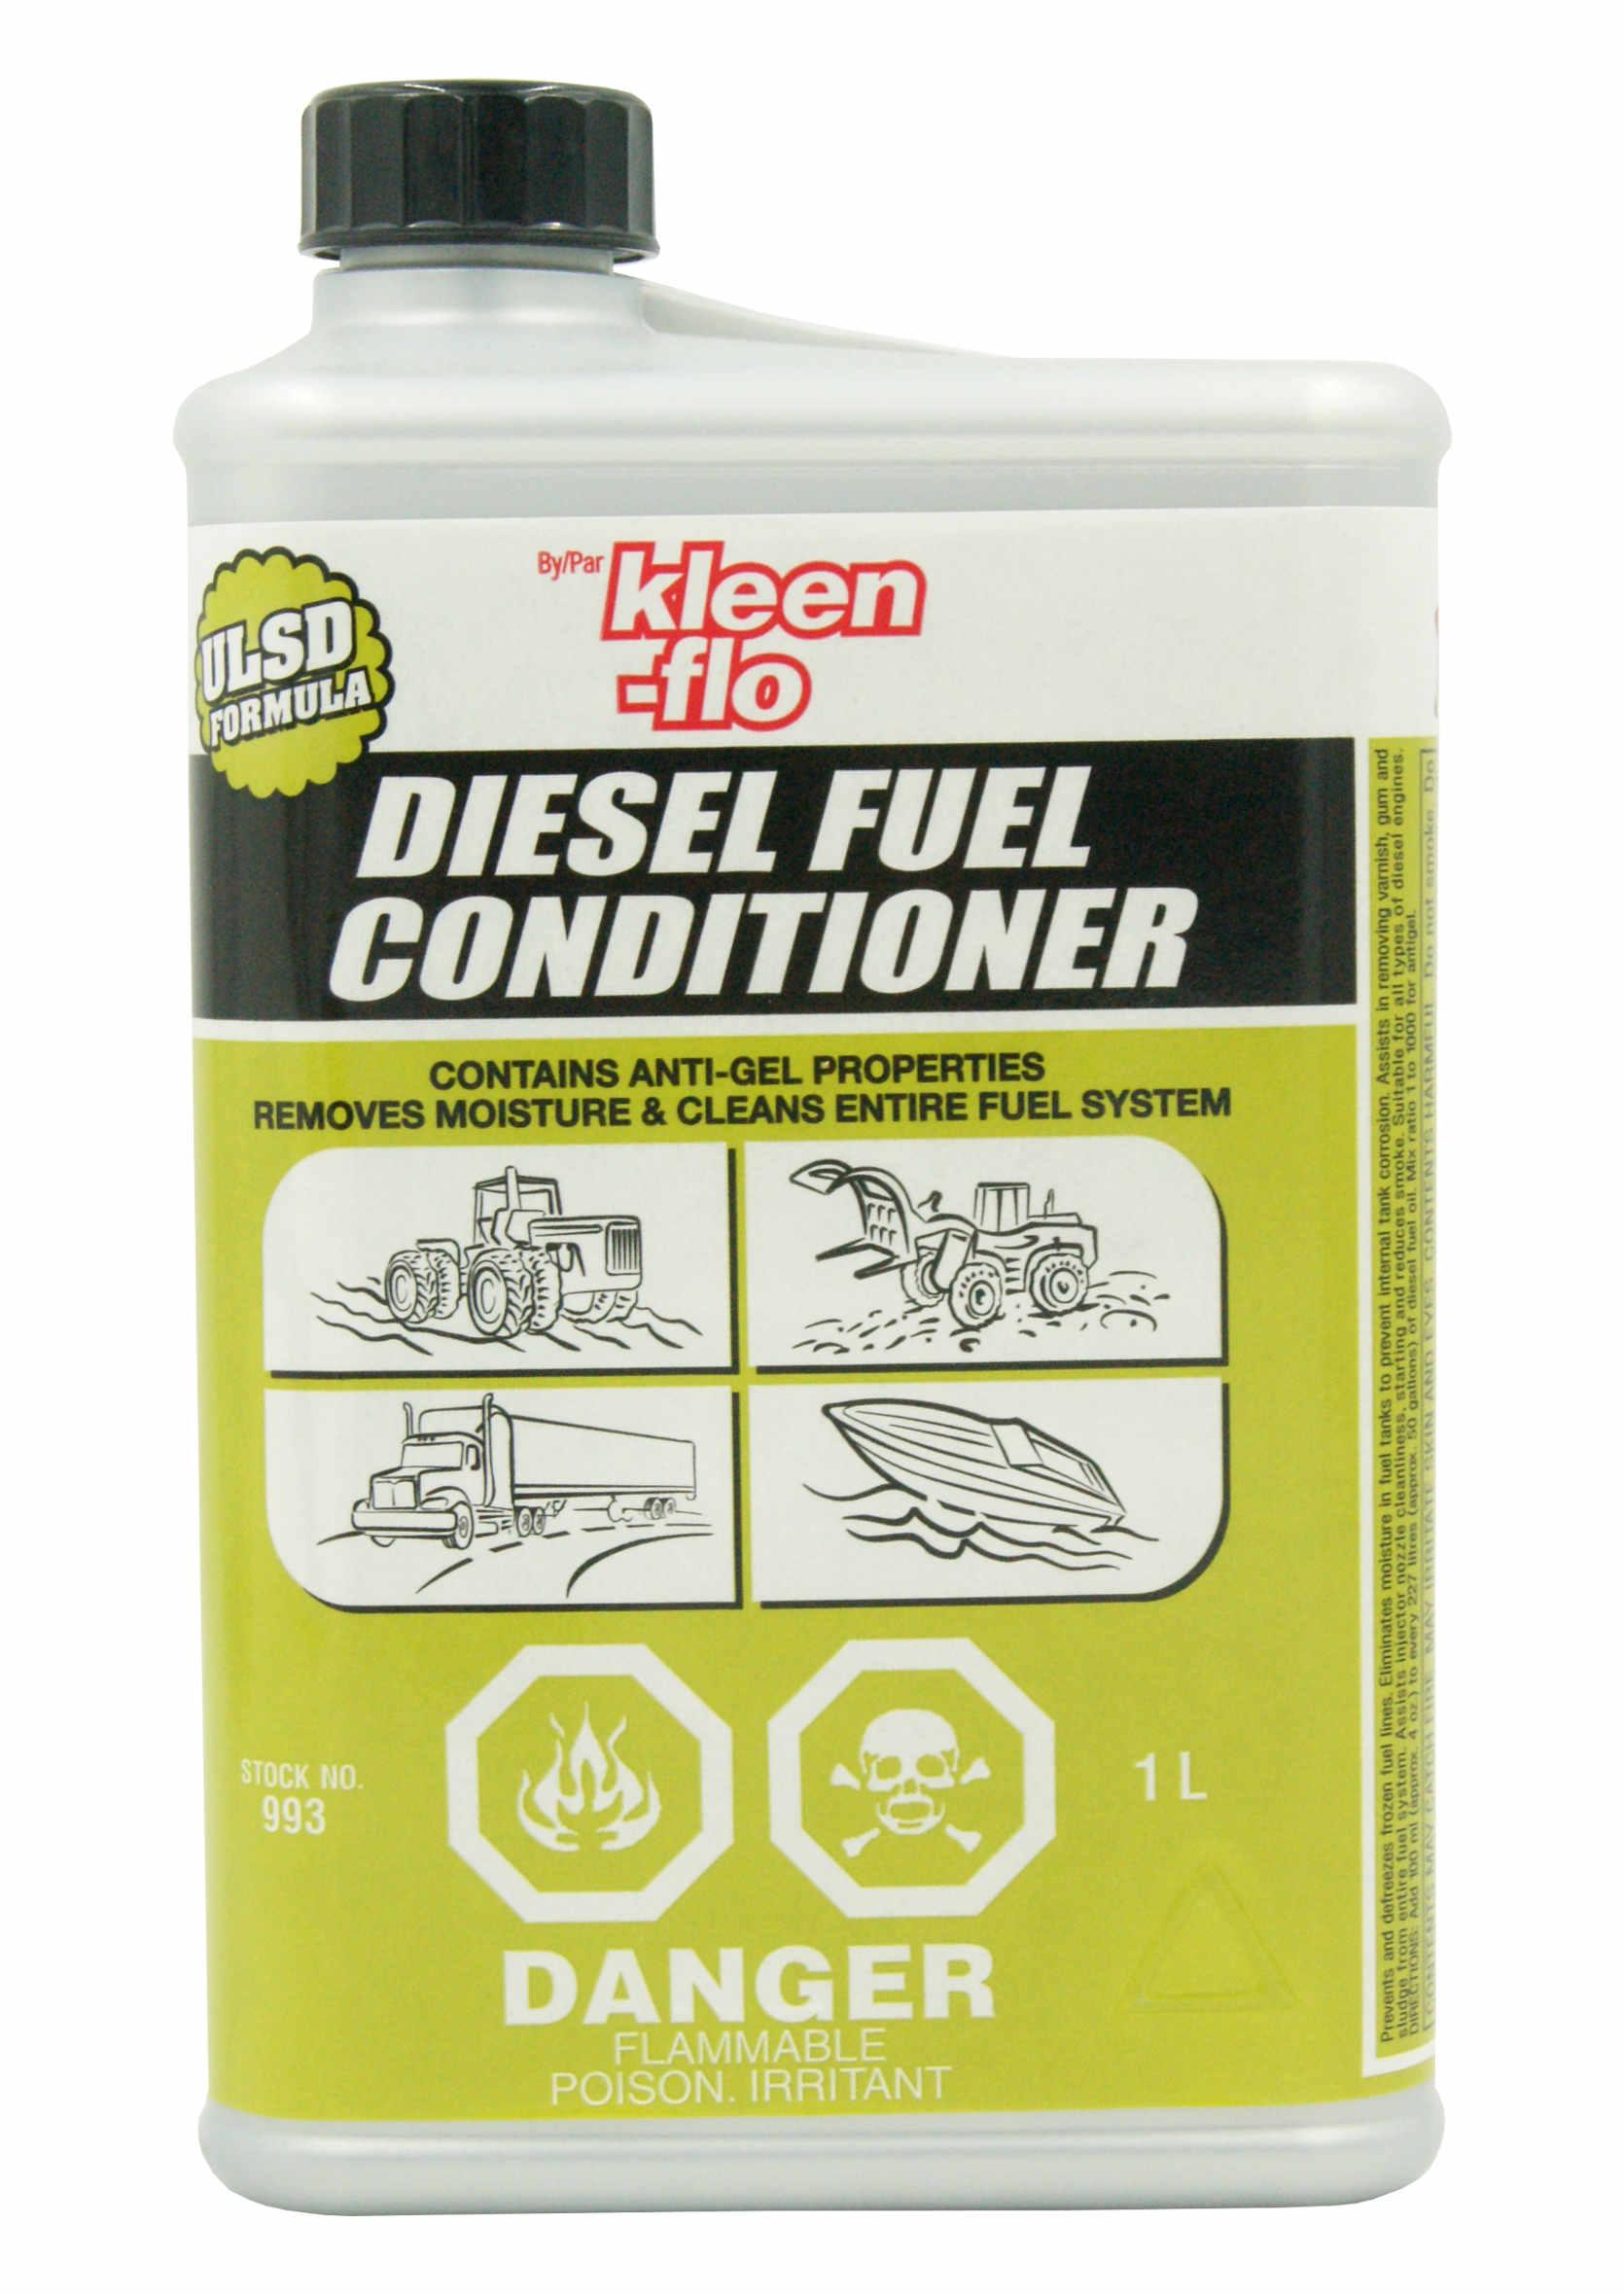 Kleen-Flo Diesel Fuel Conditioner 1L Uszlachetniający Dodatek do Diesla